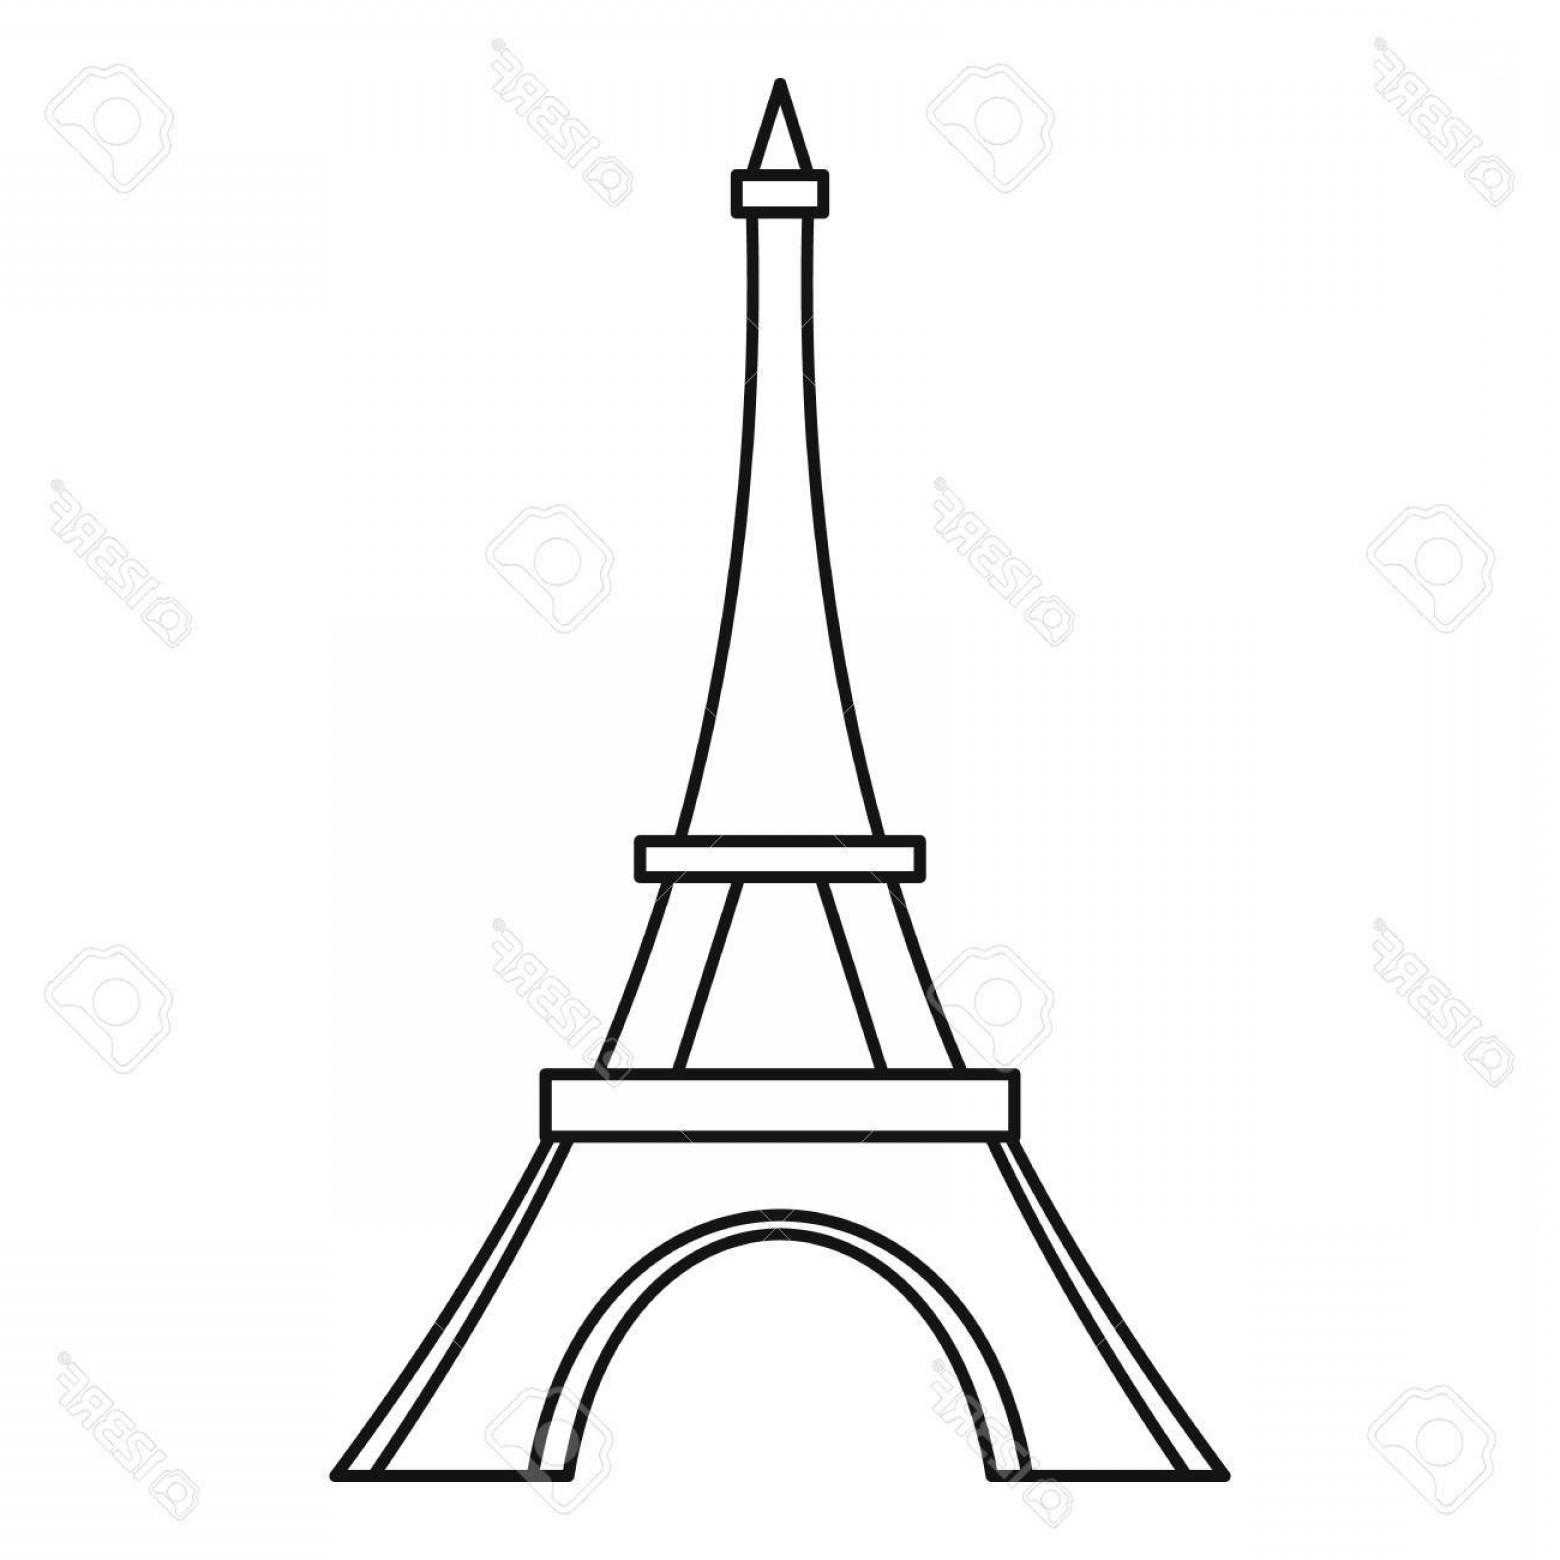 1560x1560 Photostock Vector Eiffel Tower Icon Outline Illustration Of Eiffel